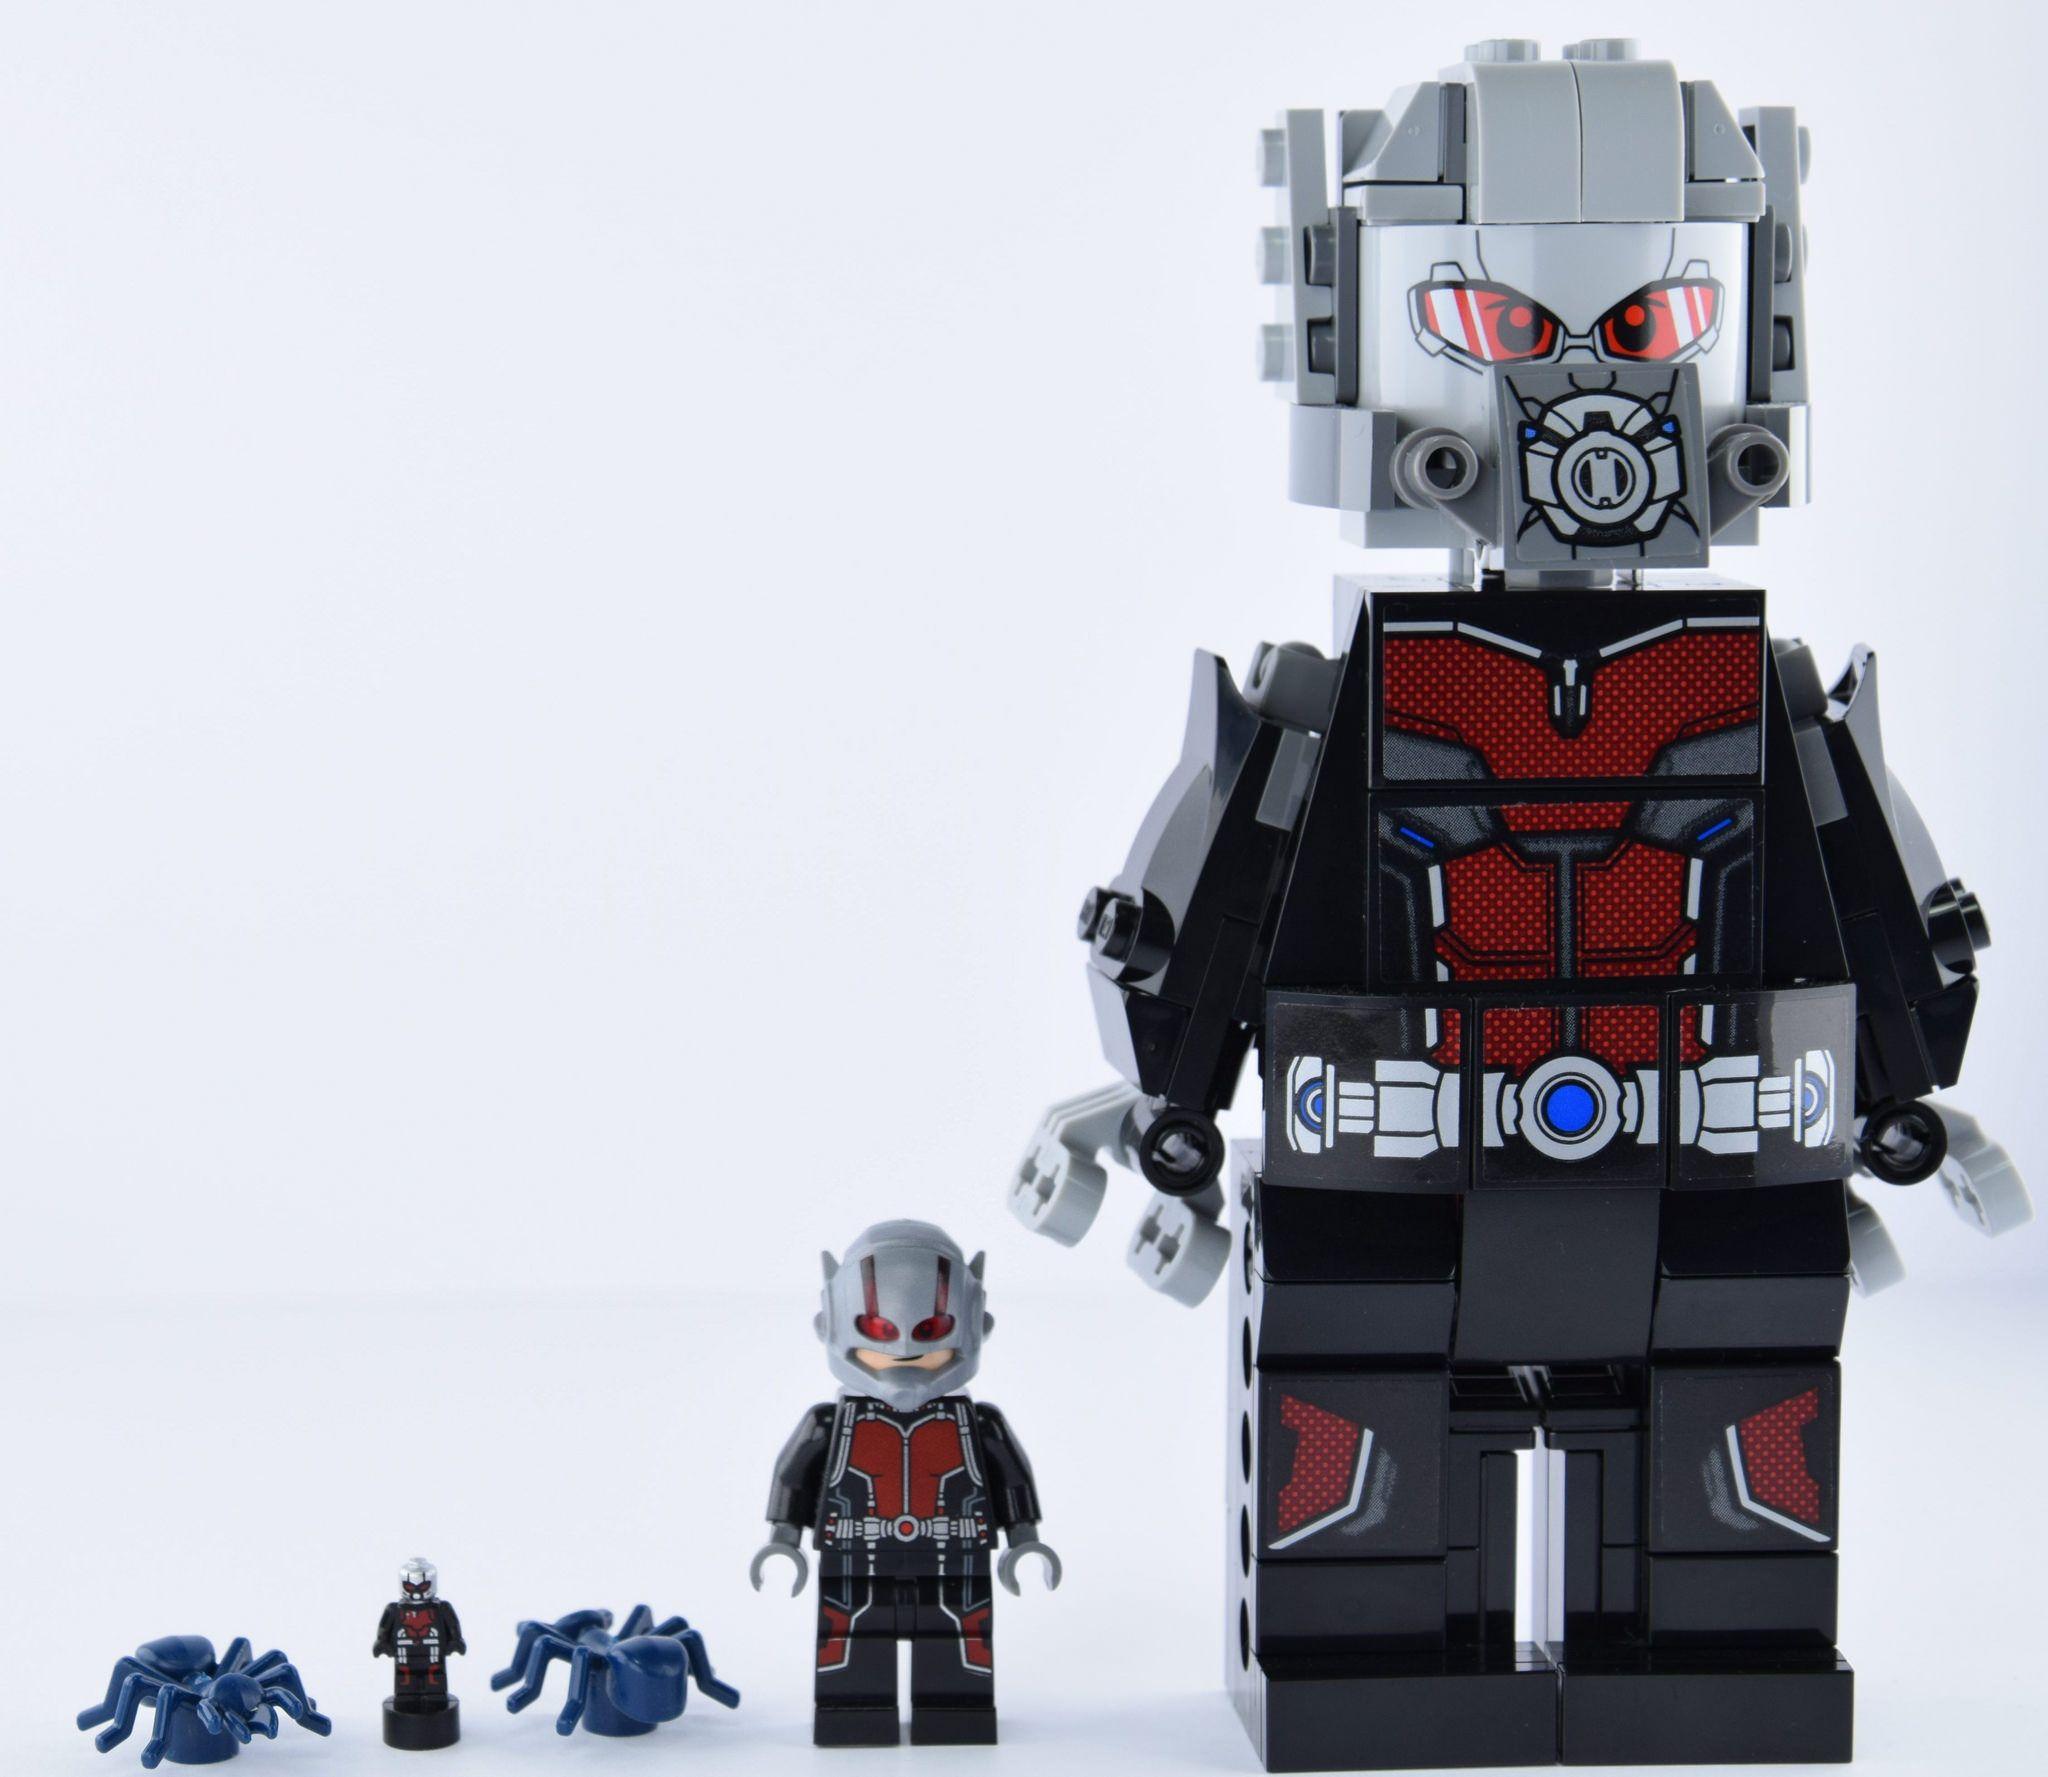 Lego Ant-man rises   Cool lego creations, Cool lego, Amazing lego creations